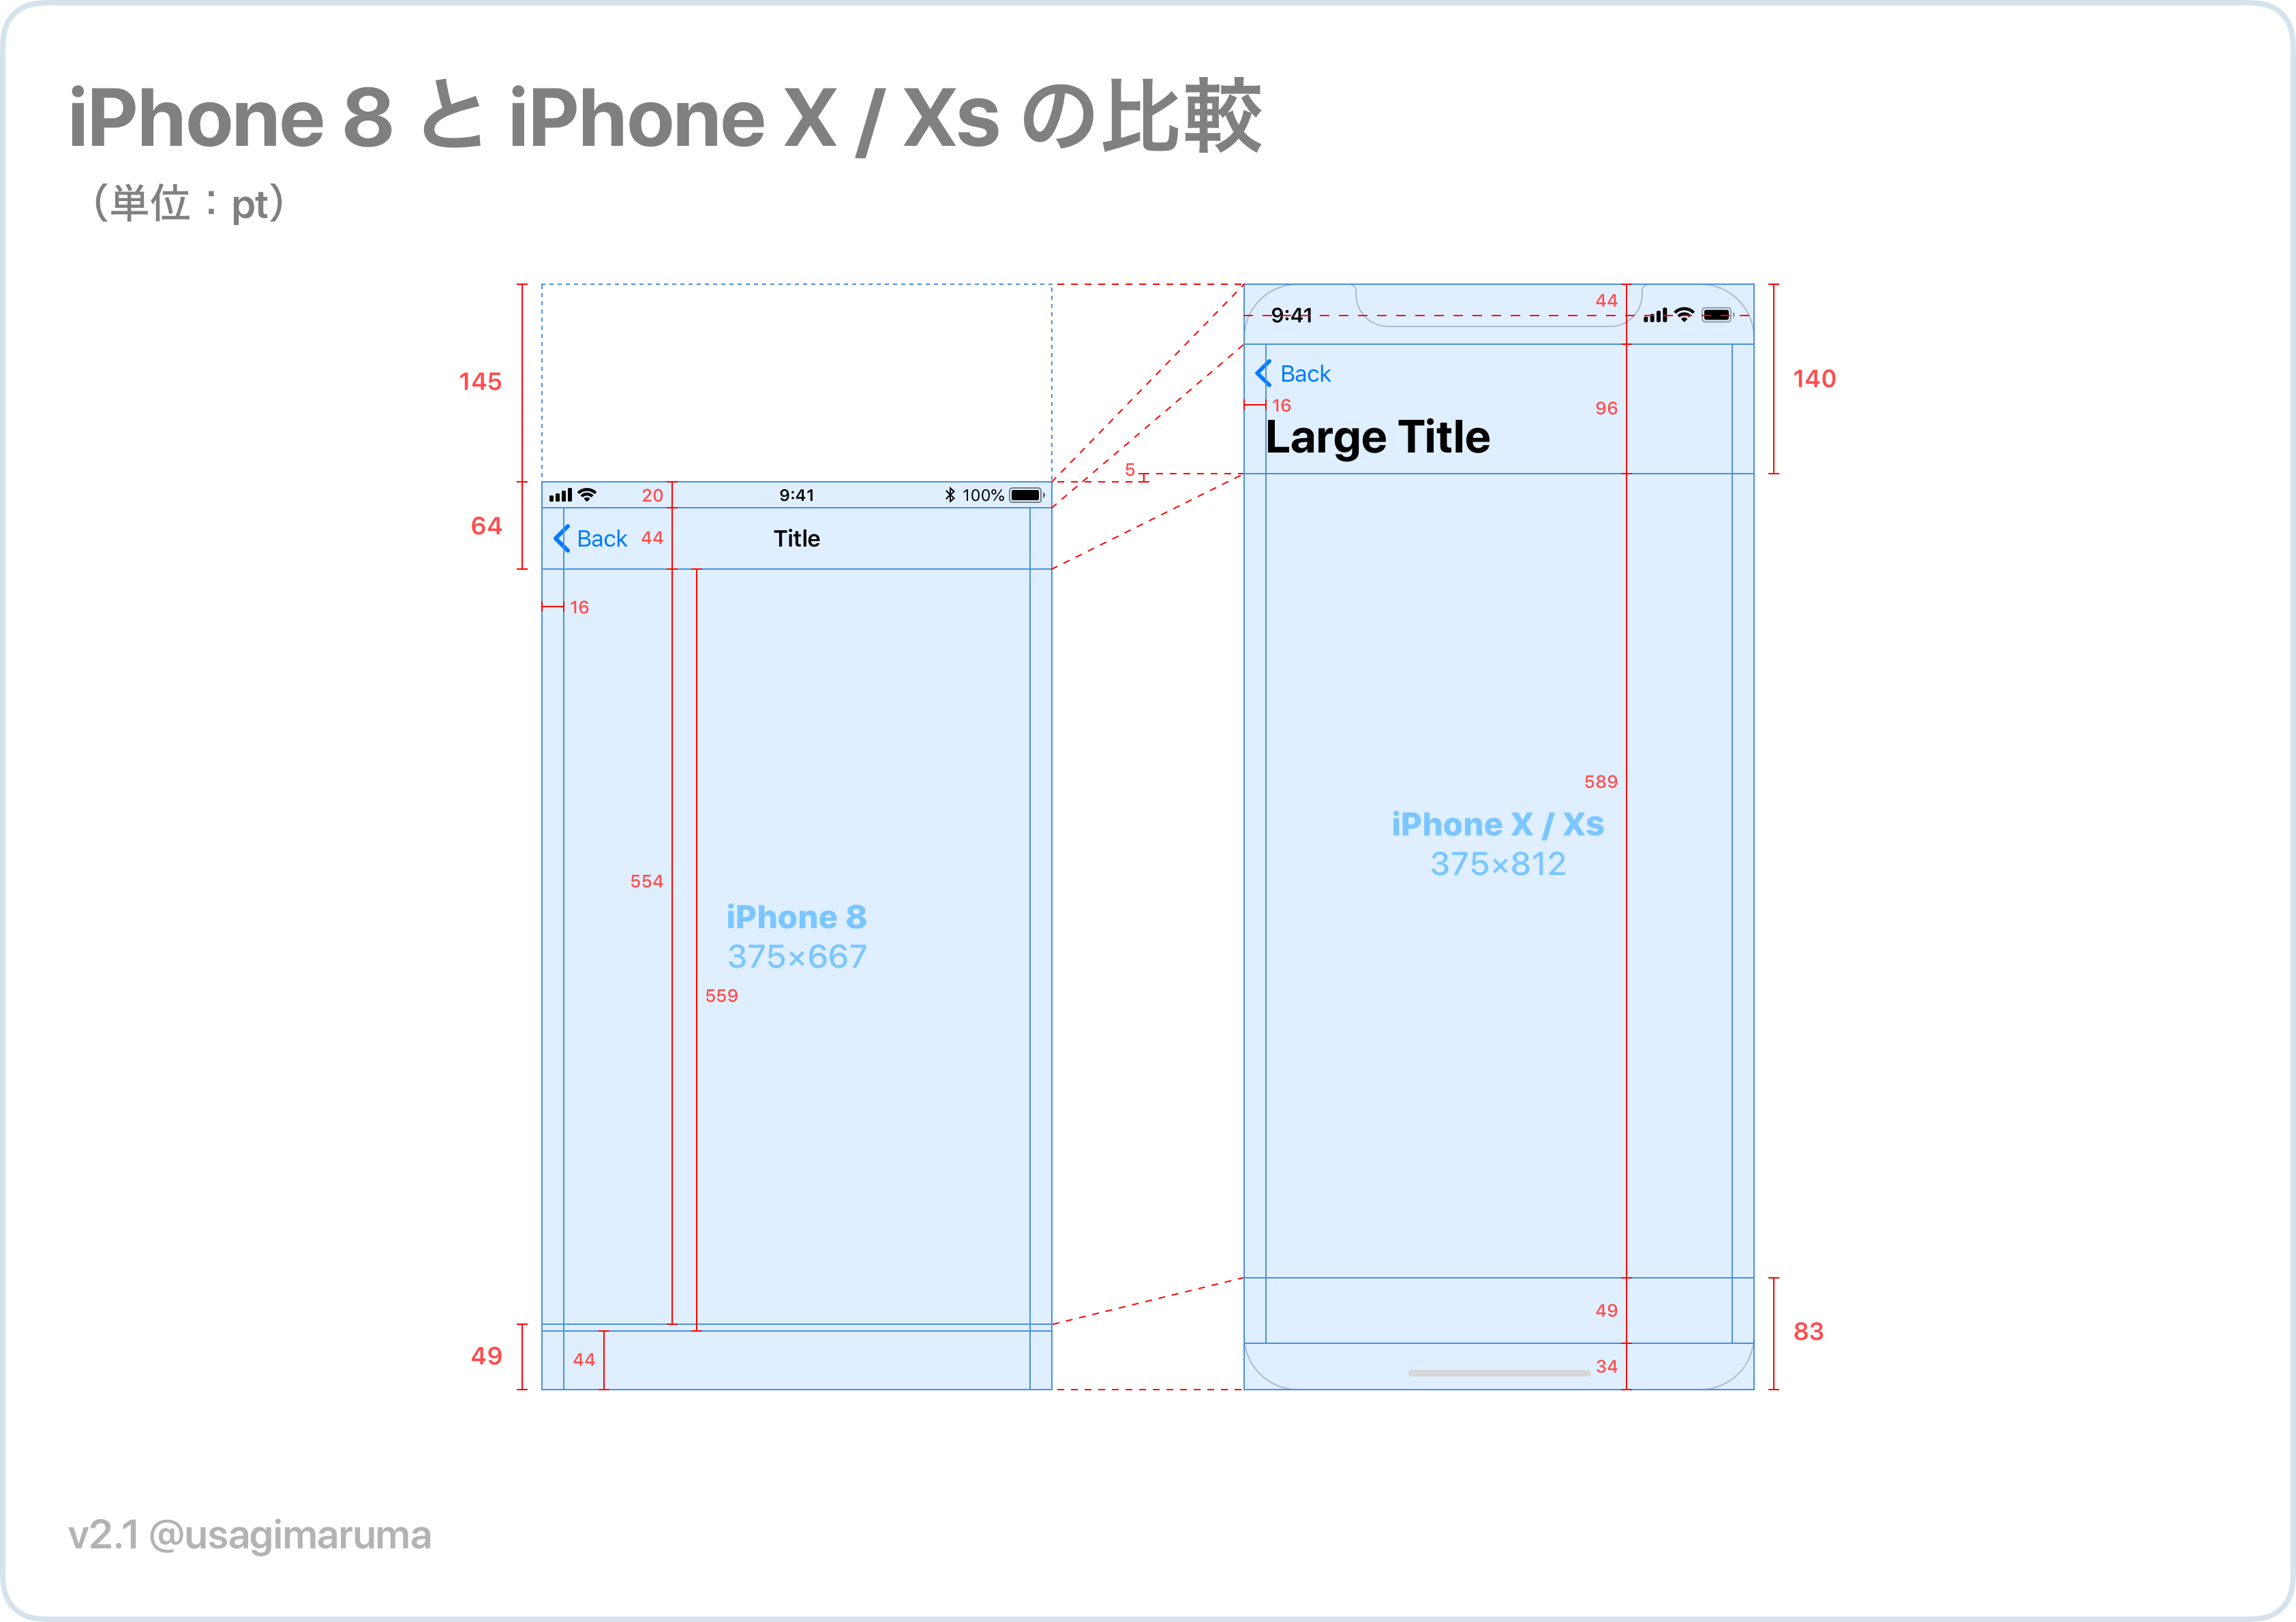 iPhone 8 vs. iPhone X, XS